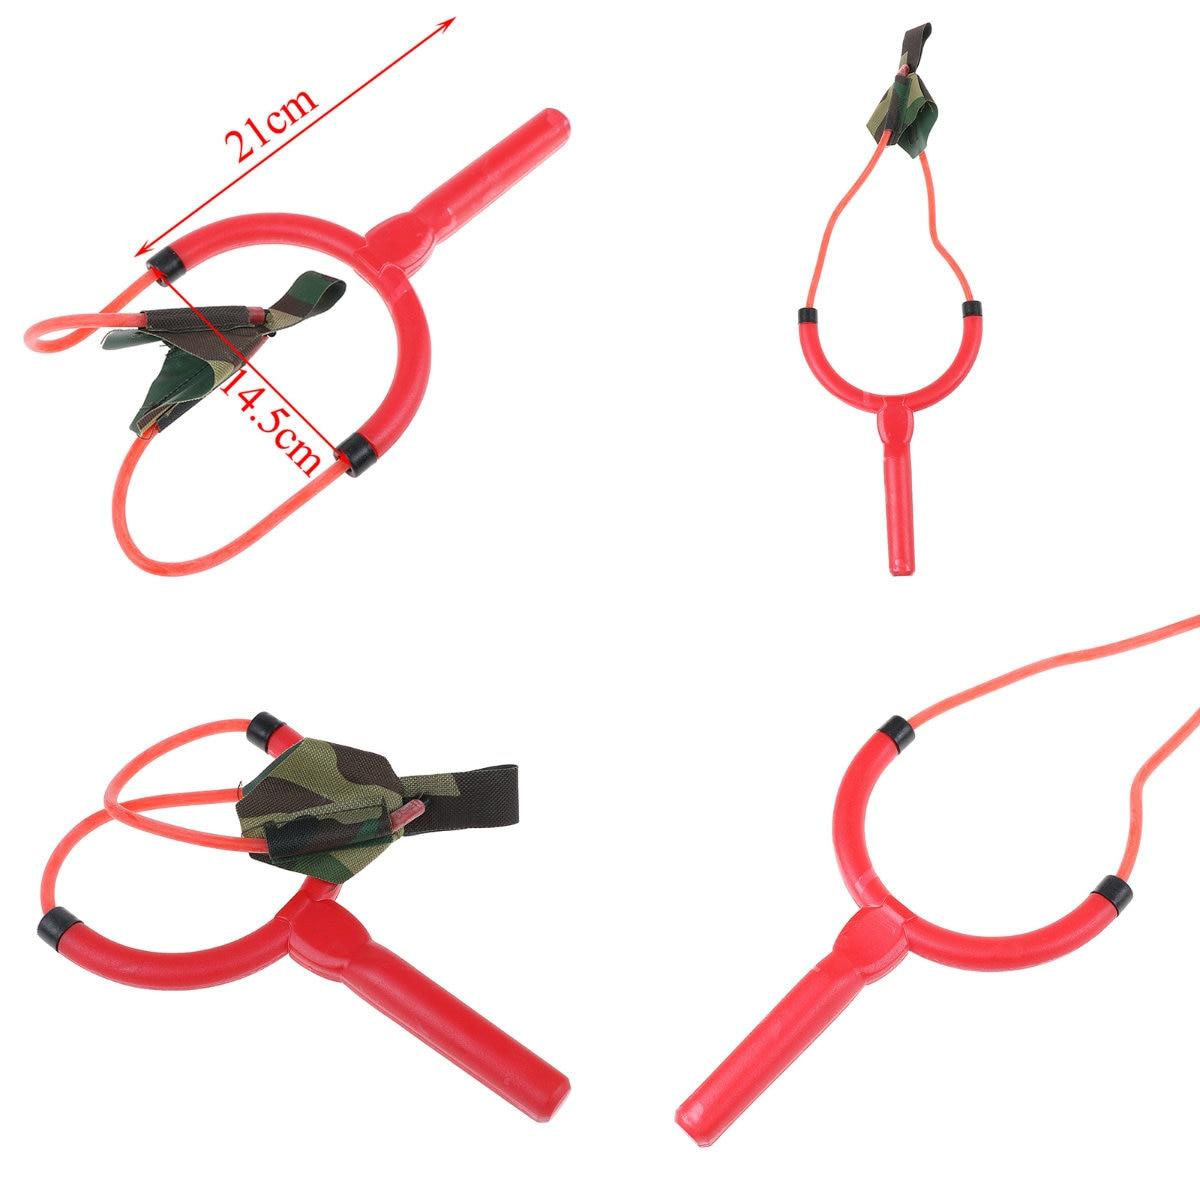 New Portable Fishing Bait Thrower Slingshot Rubber Band Plastic Fishing Catapult Fishing Tool 12.5cm X 11.2cm